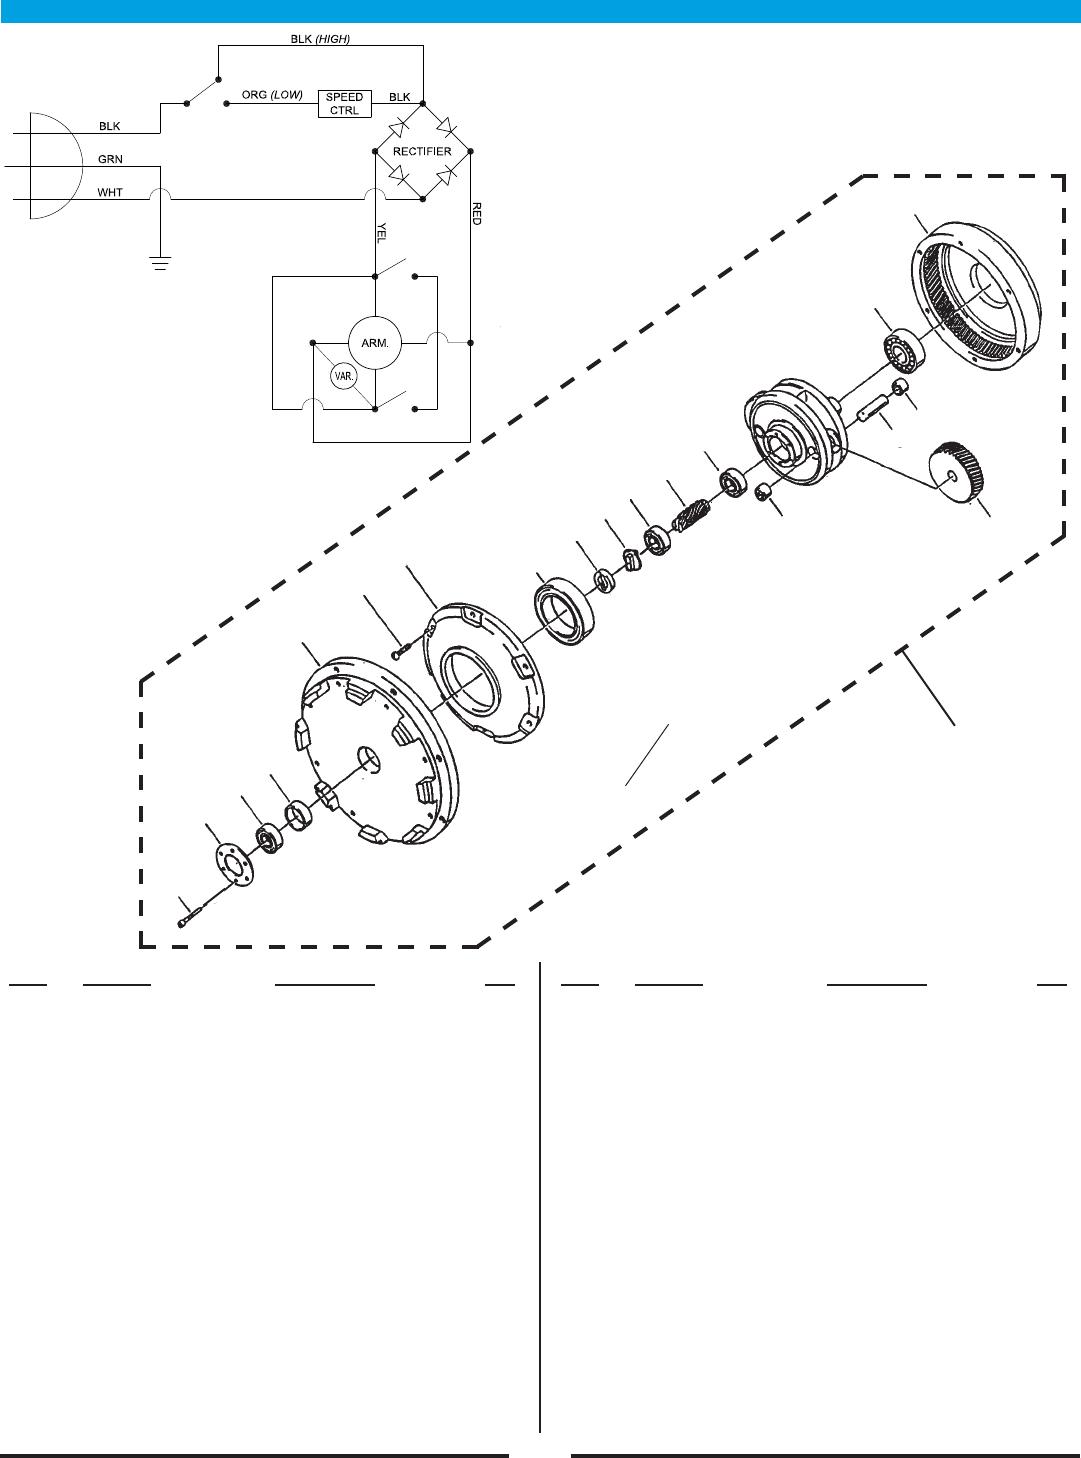 Pioneer eclipse 225fp floor care machine operator parts manual